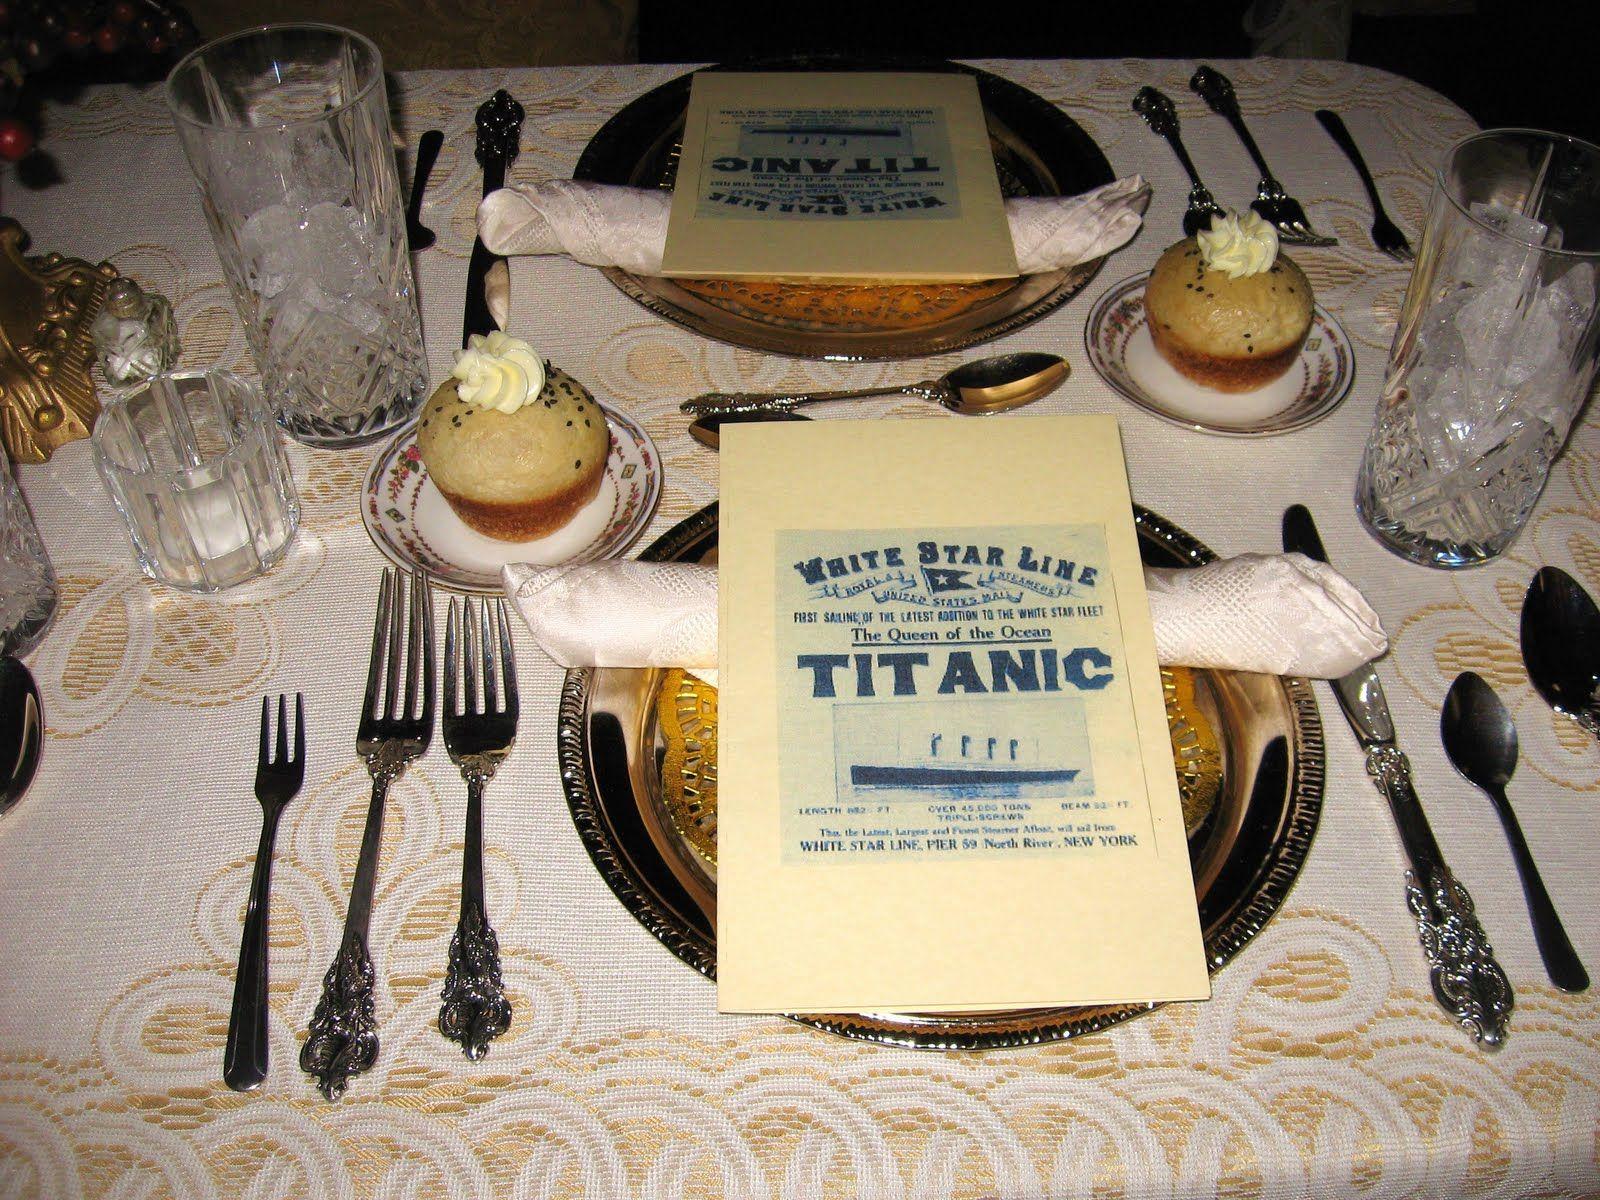 Prom Dinner Party Ideas Part - 38: Titanic Theme Party | Photographer/Author John Thomas Grant